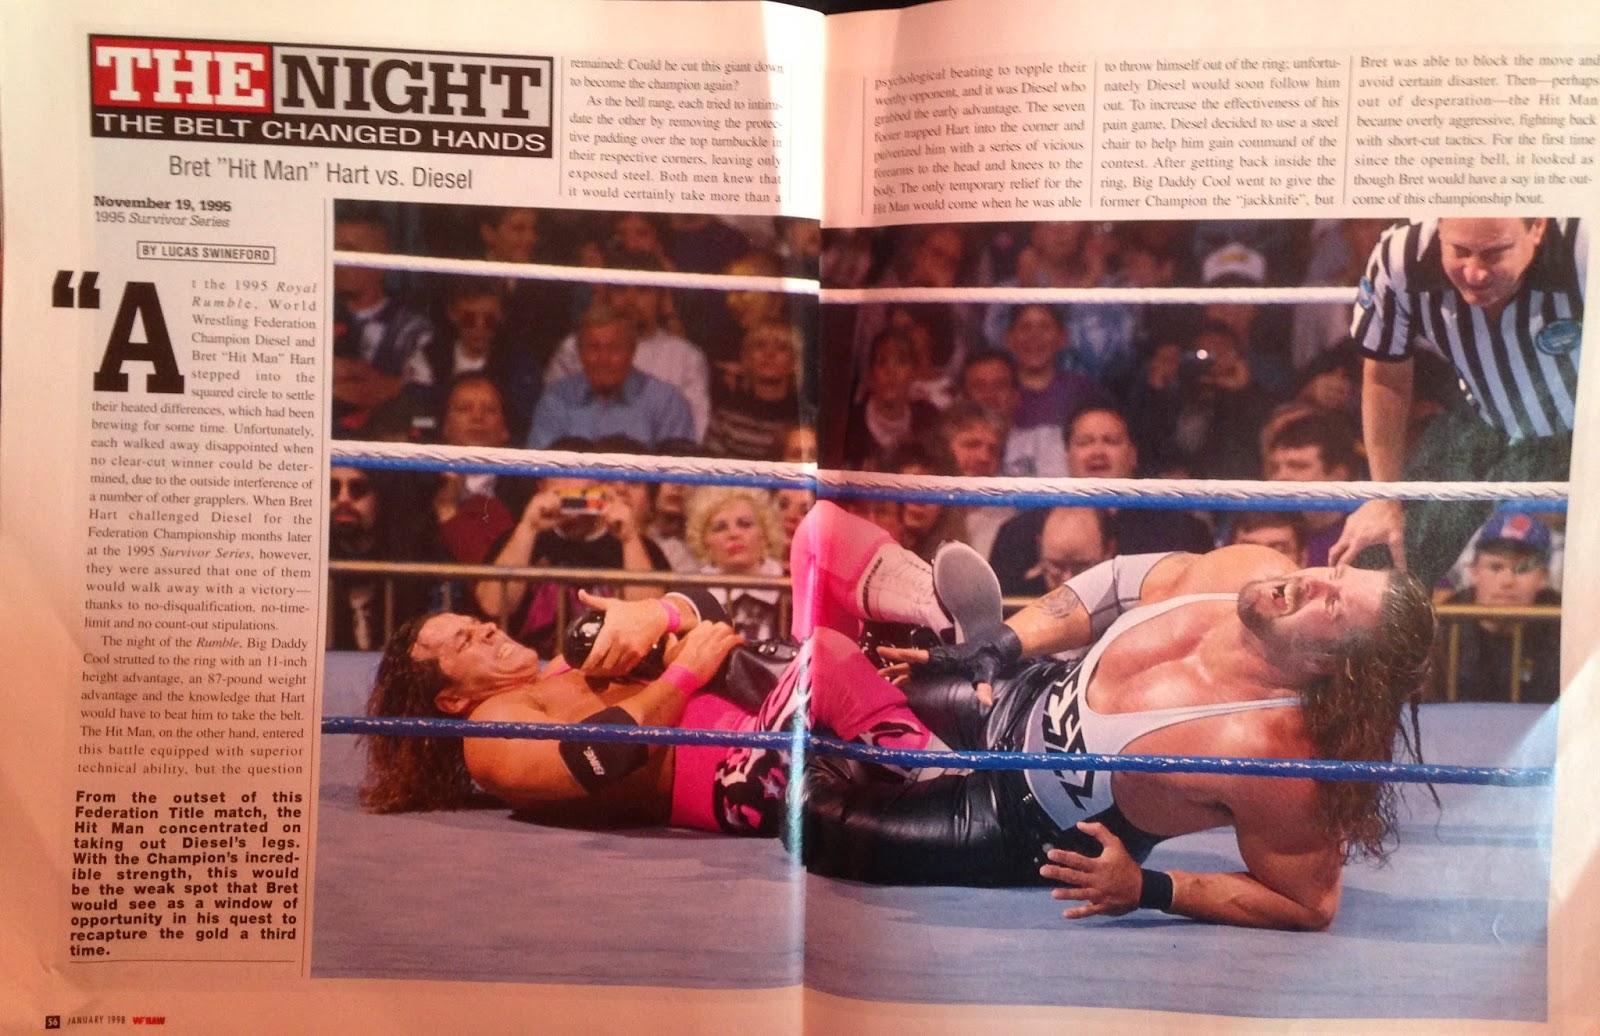 WWE: WWF RAW MAGAZINE - January 1998 - Bret Hart vs. Diesel Survivor Series 1995 recap